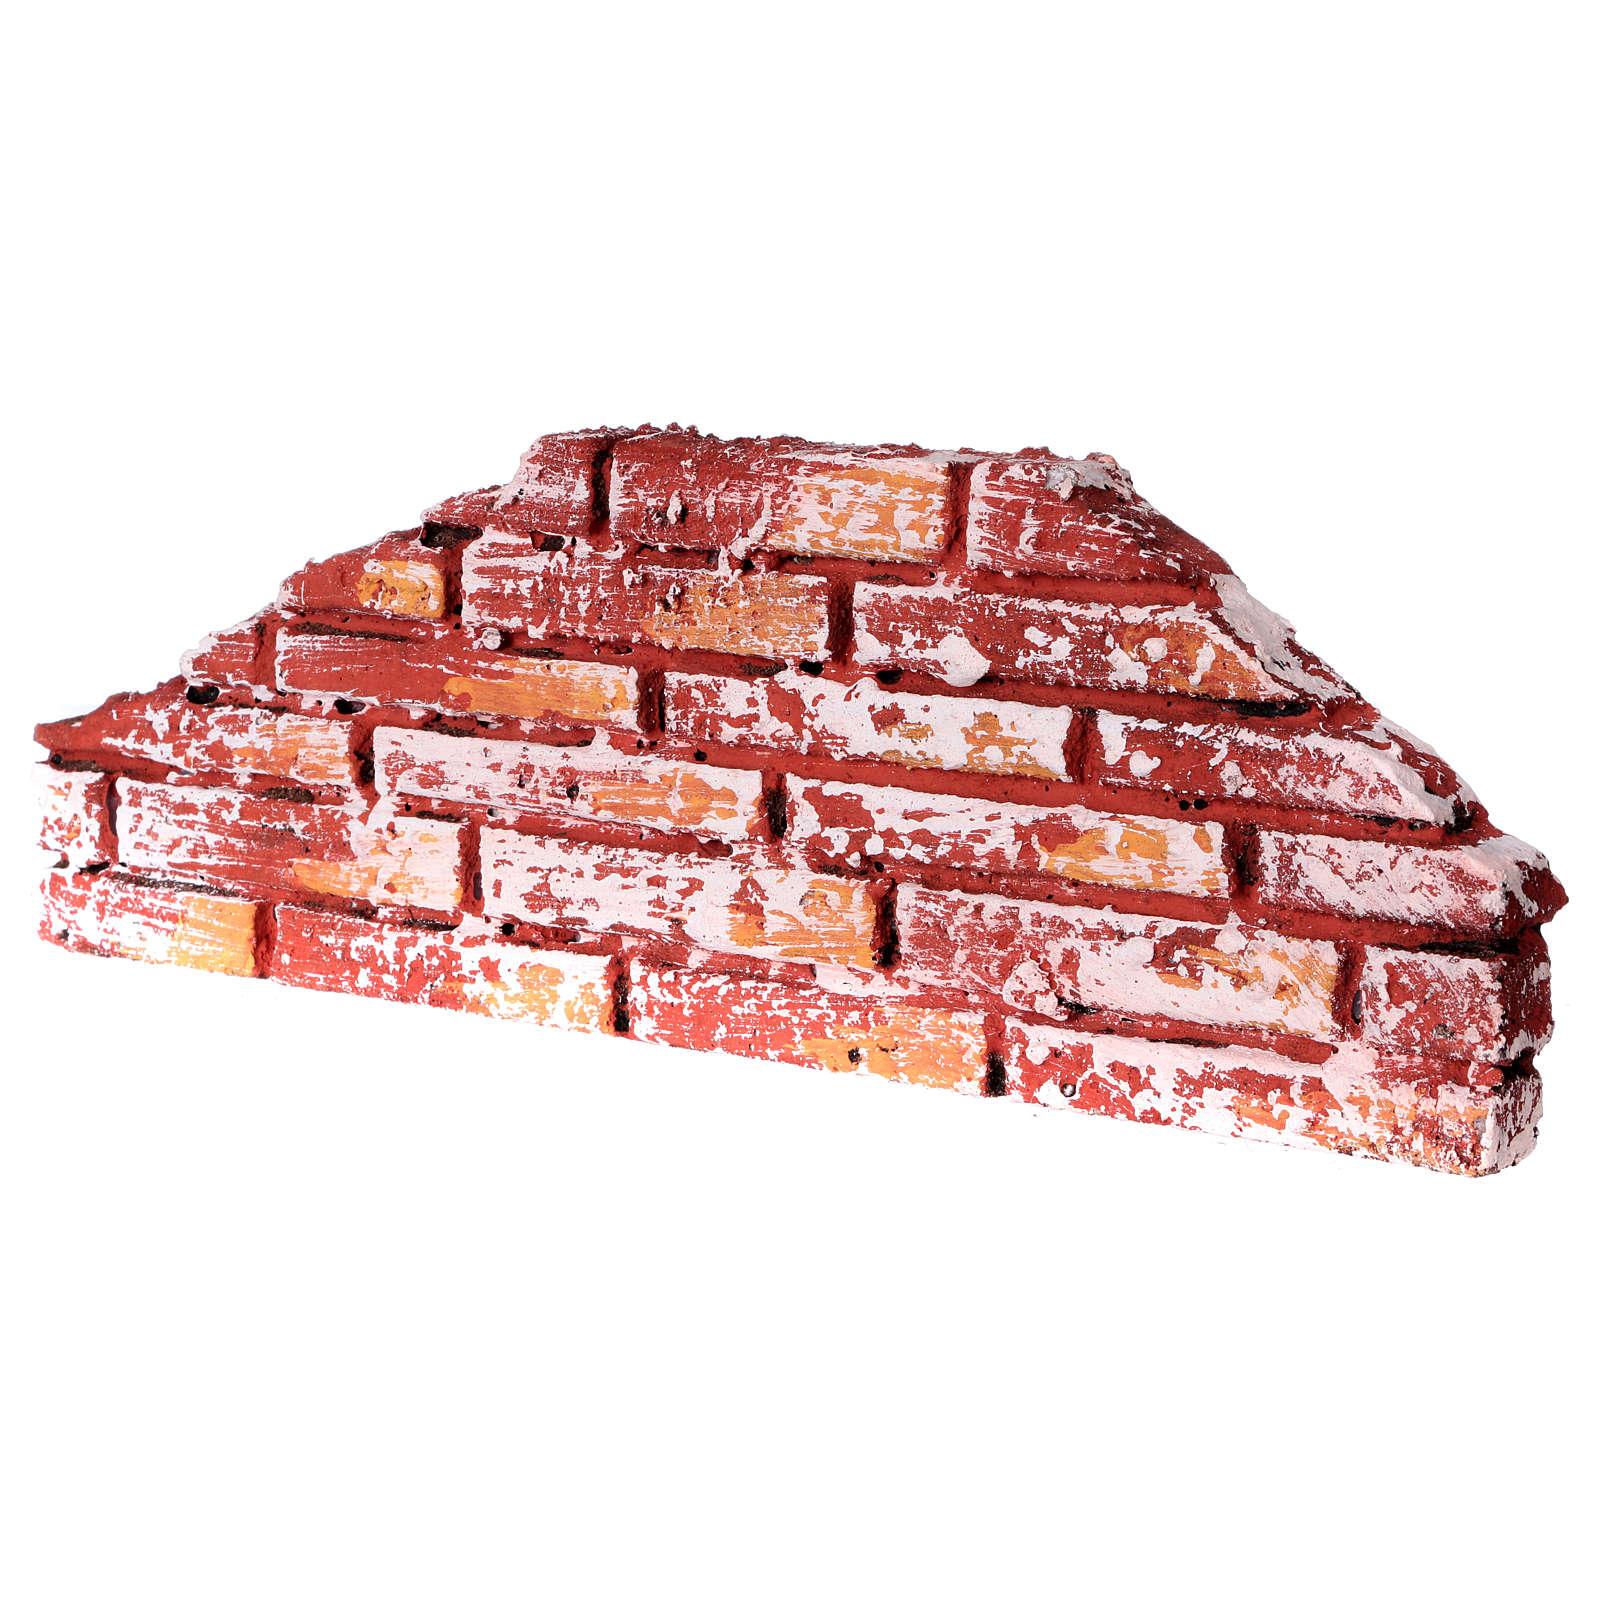 Mauerbrüstung, rustikal, aus Polystyrol, farbig gefasst, 10x25x2 cm 4